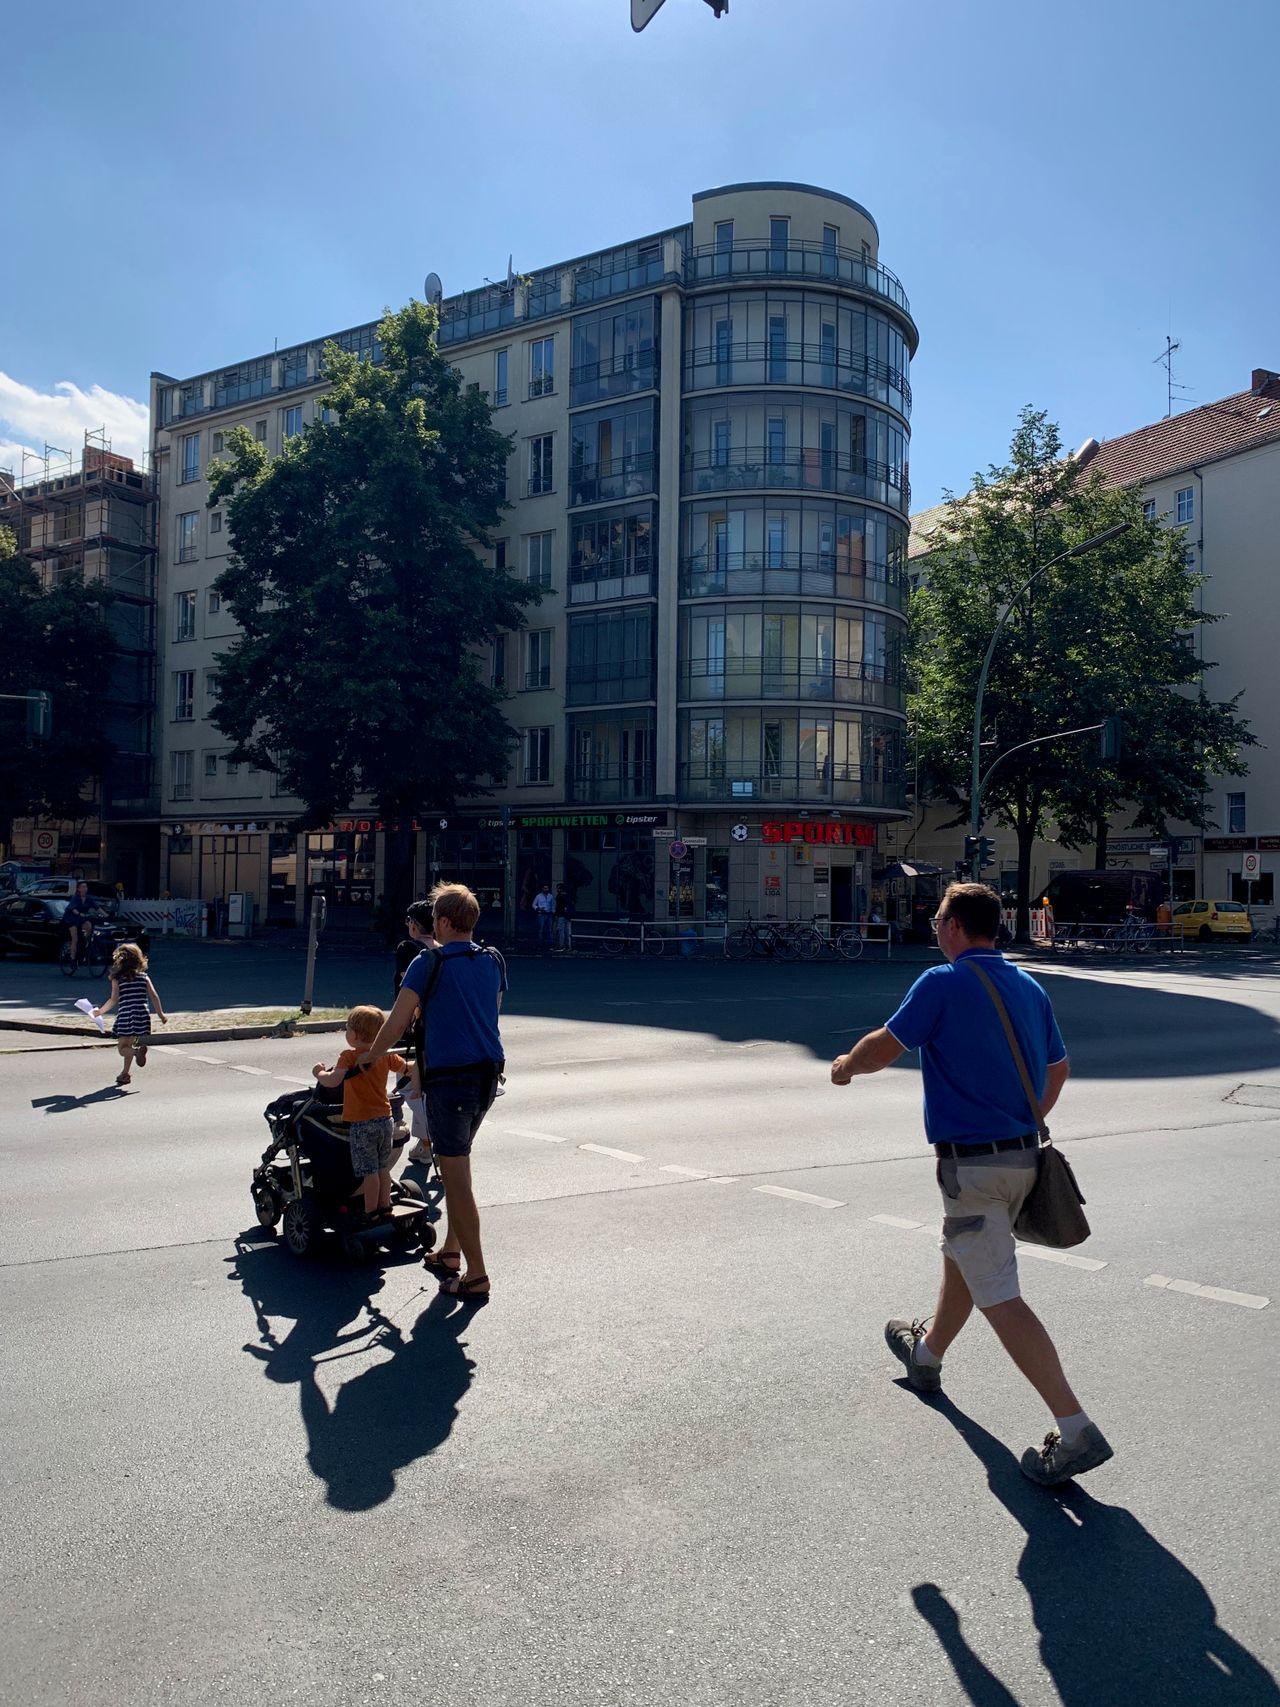 Hertzbergstraße